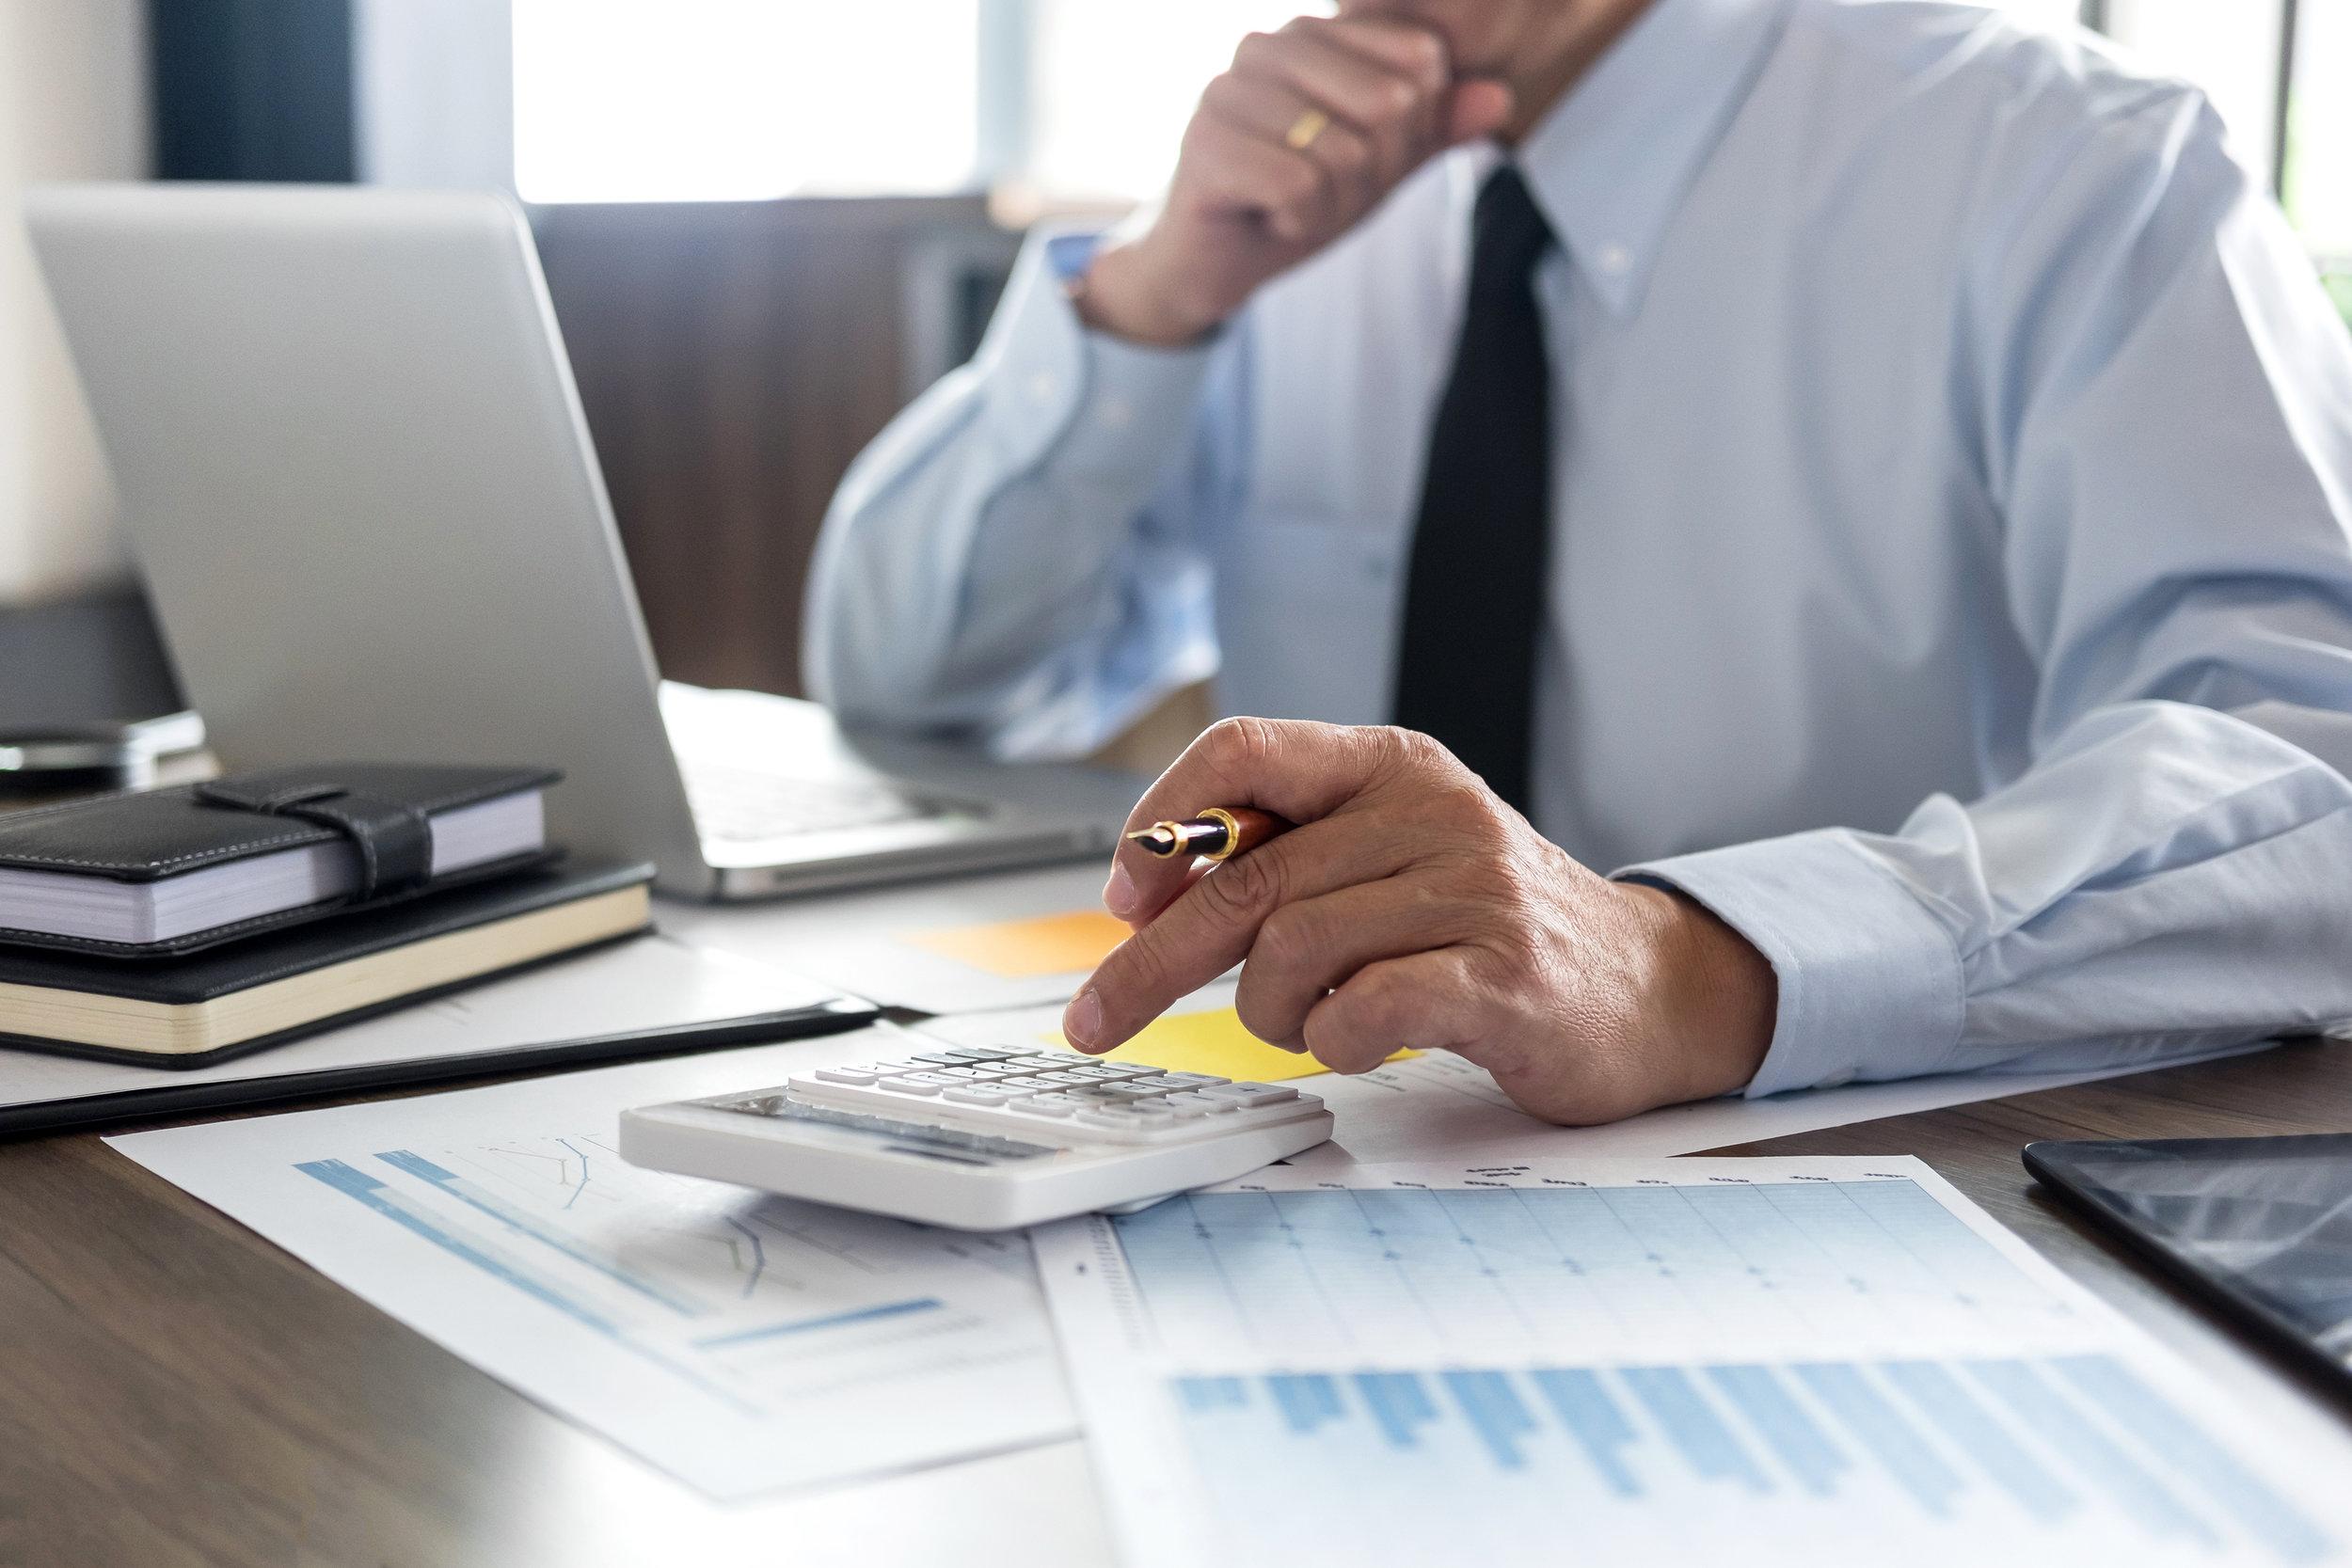 bigstock-Business-Financing-Accounting--237025819.jpg